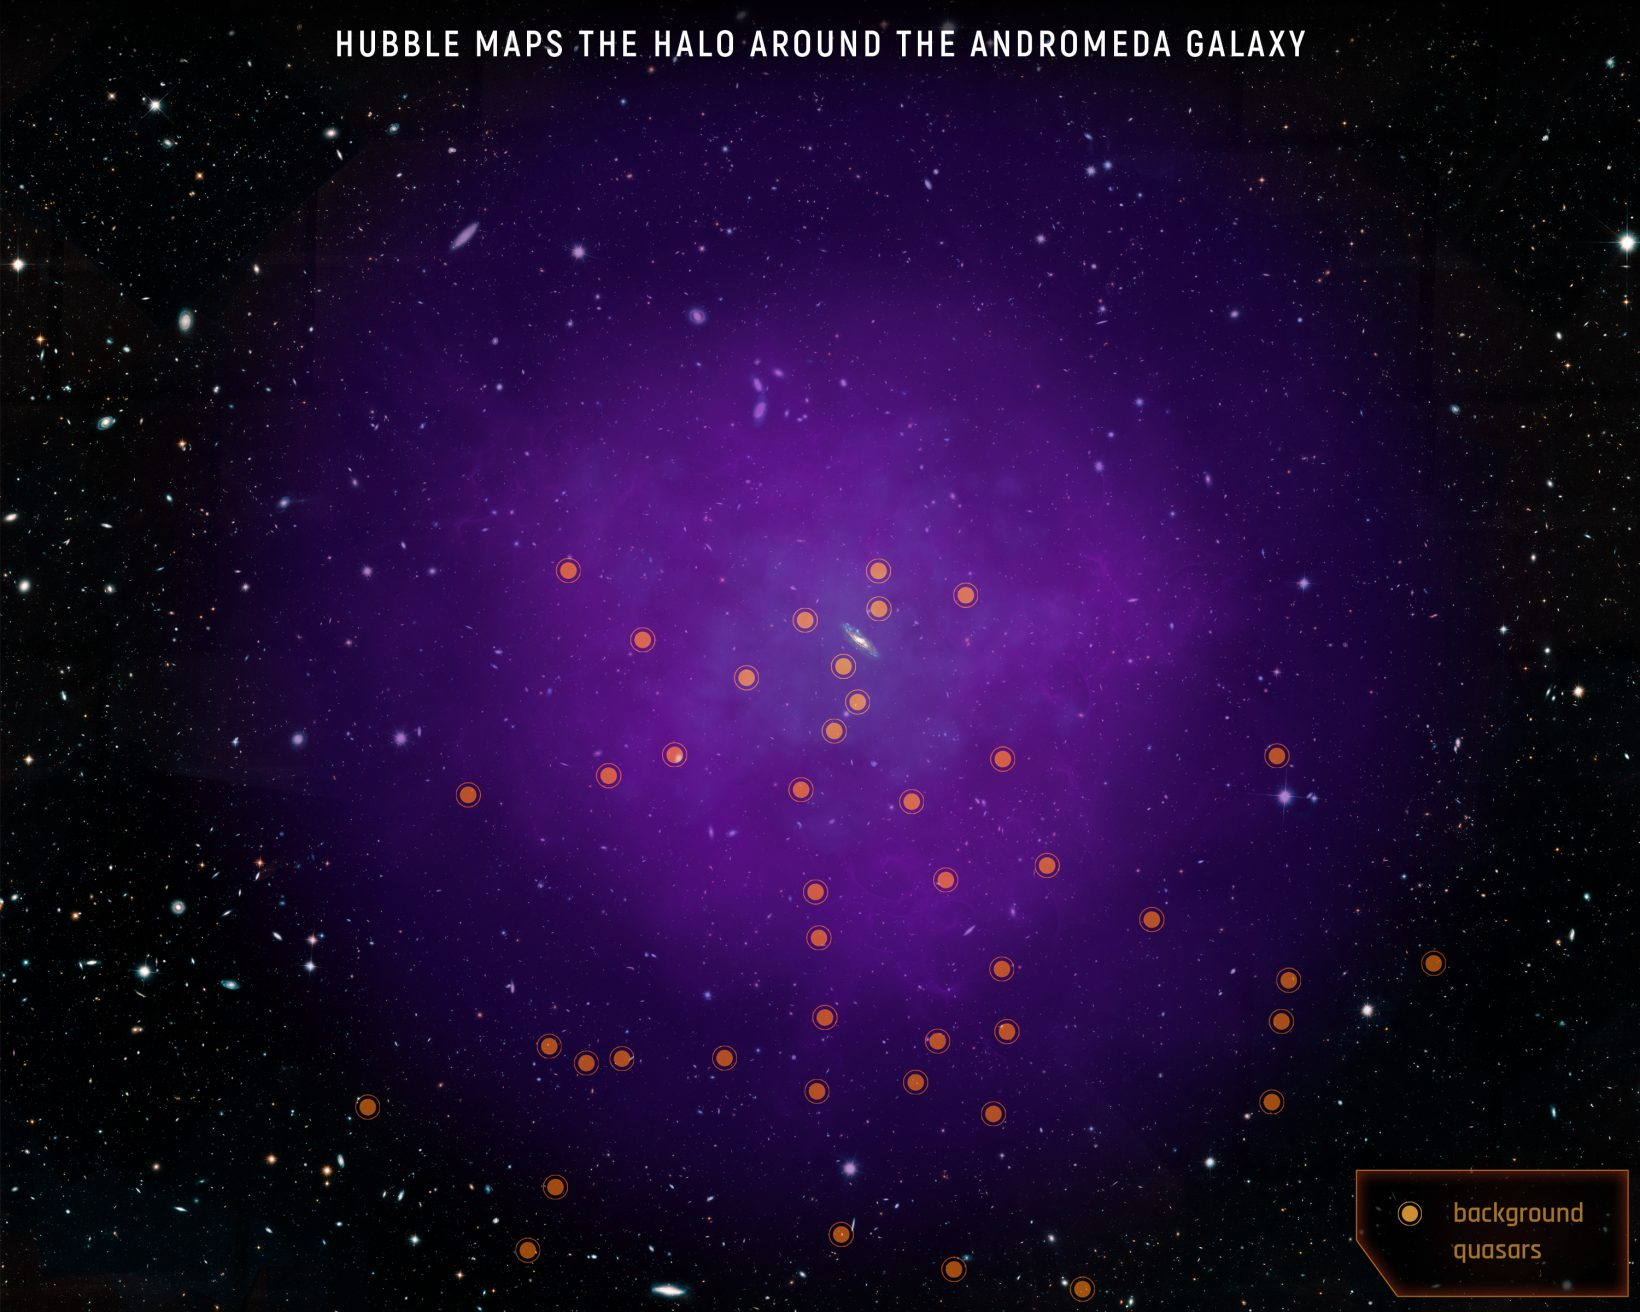 Gao of Andromeda Galaxy and background quasars